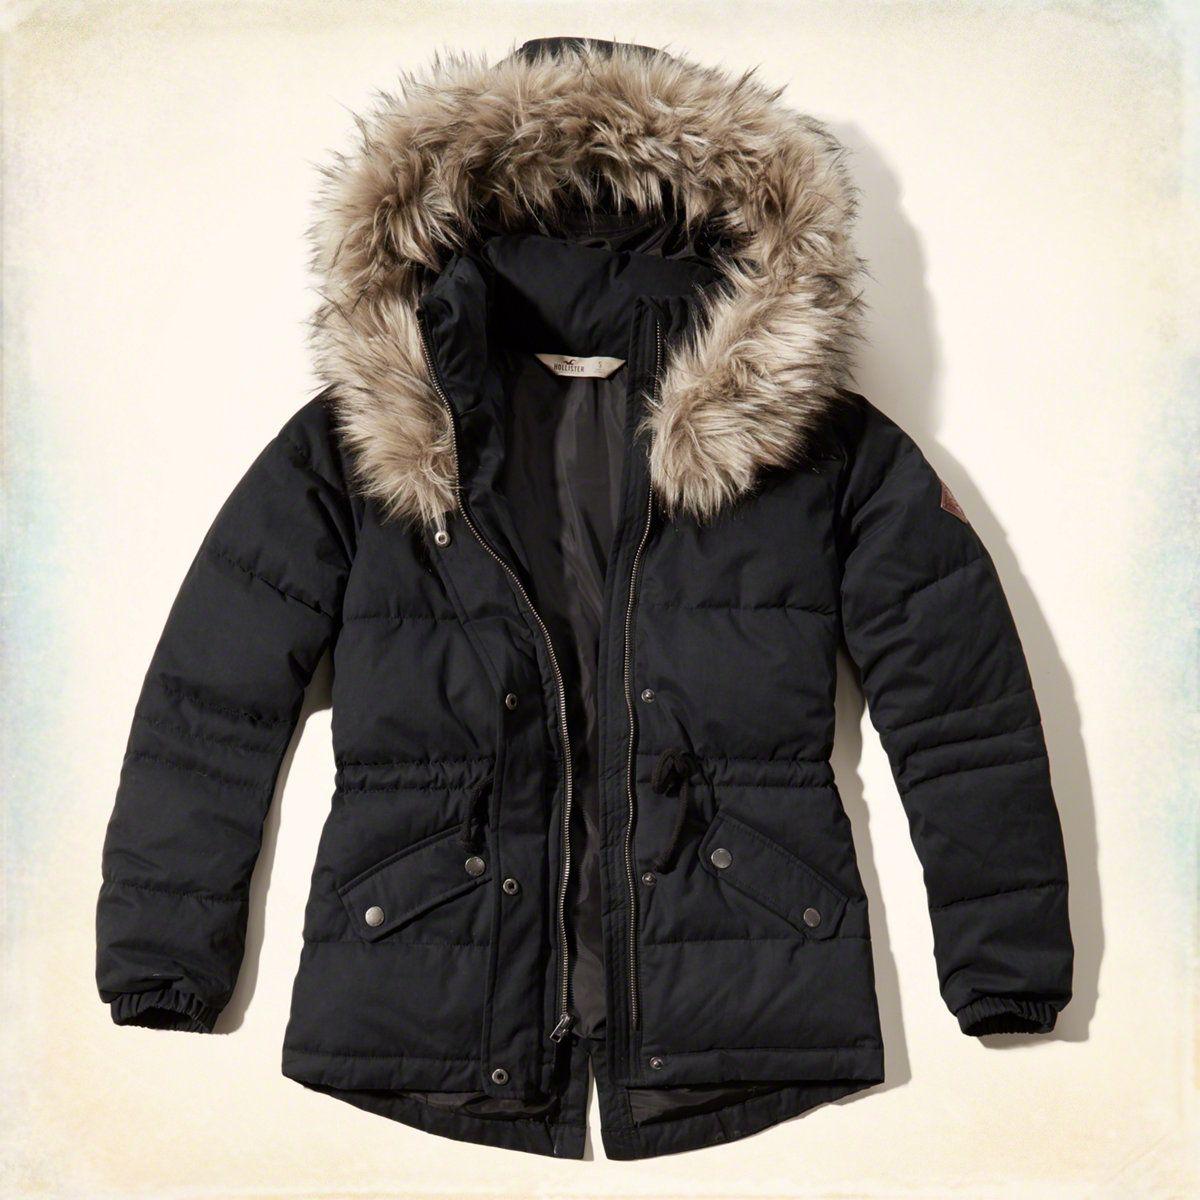 Girls Hollister Elevated Puffer Jacket | Girls Jackets & Outerwear ...